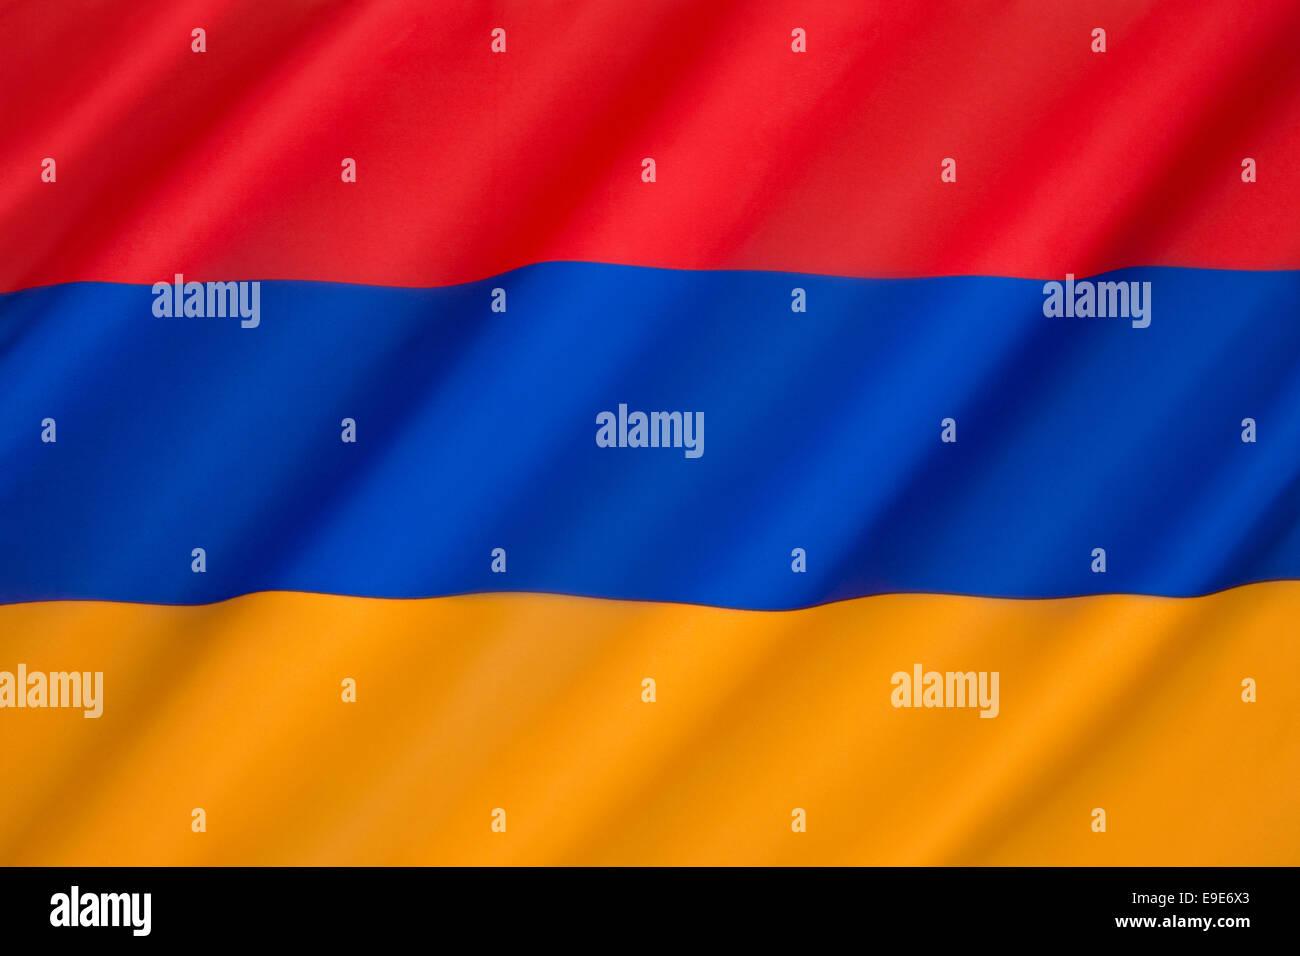 A bandeira nacional da República da Arménia Imagens de Stock